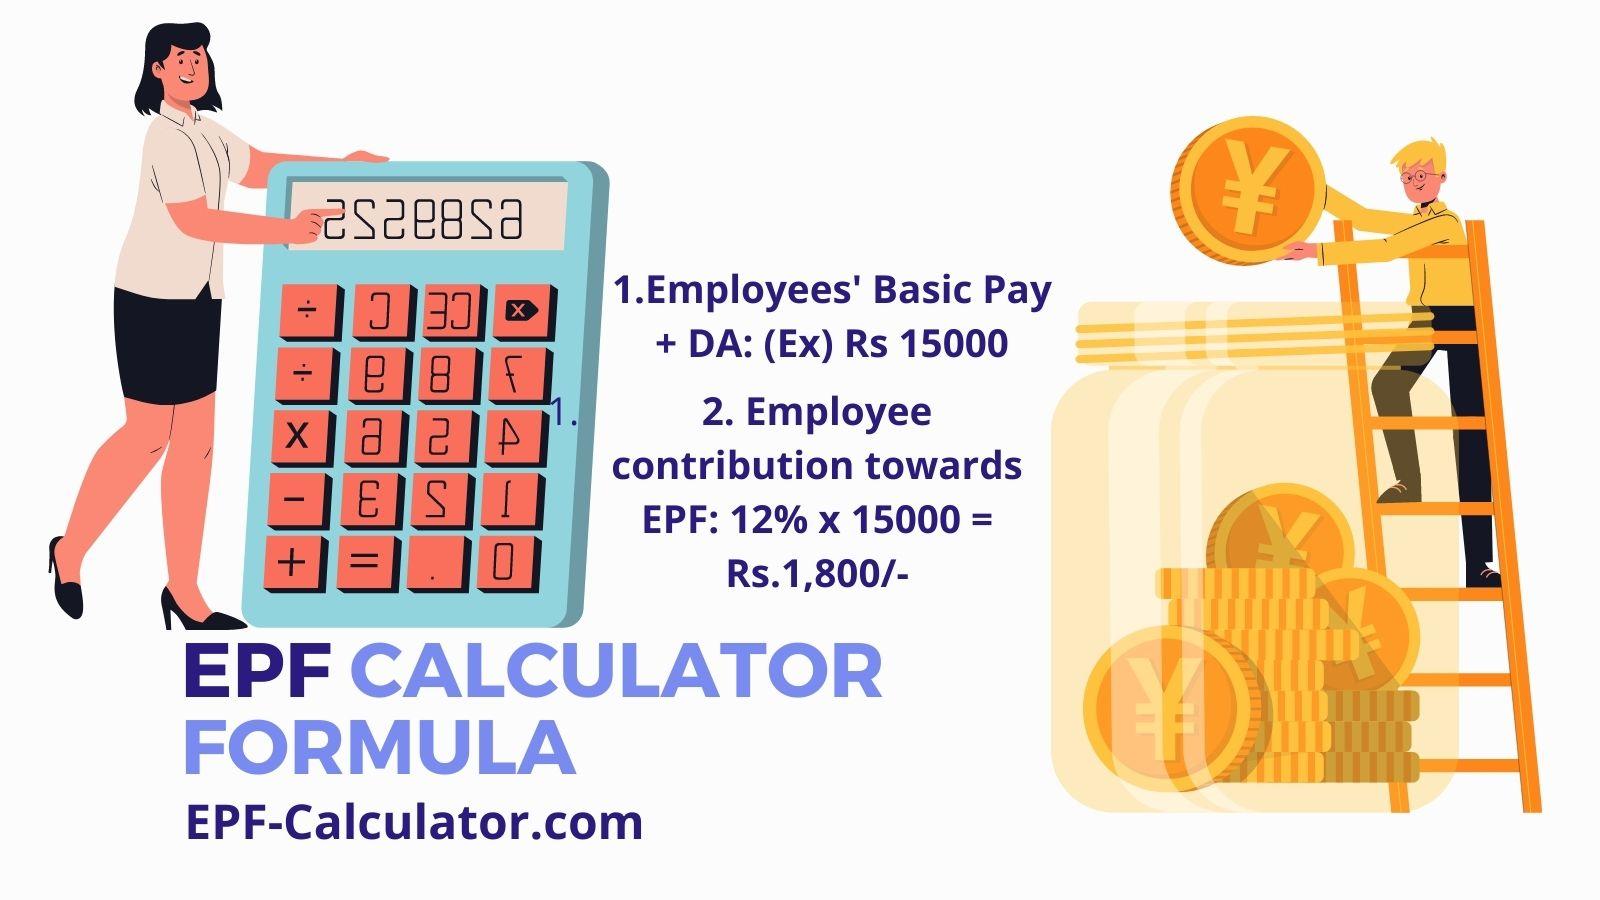 EPF Calculator Formula